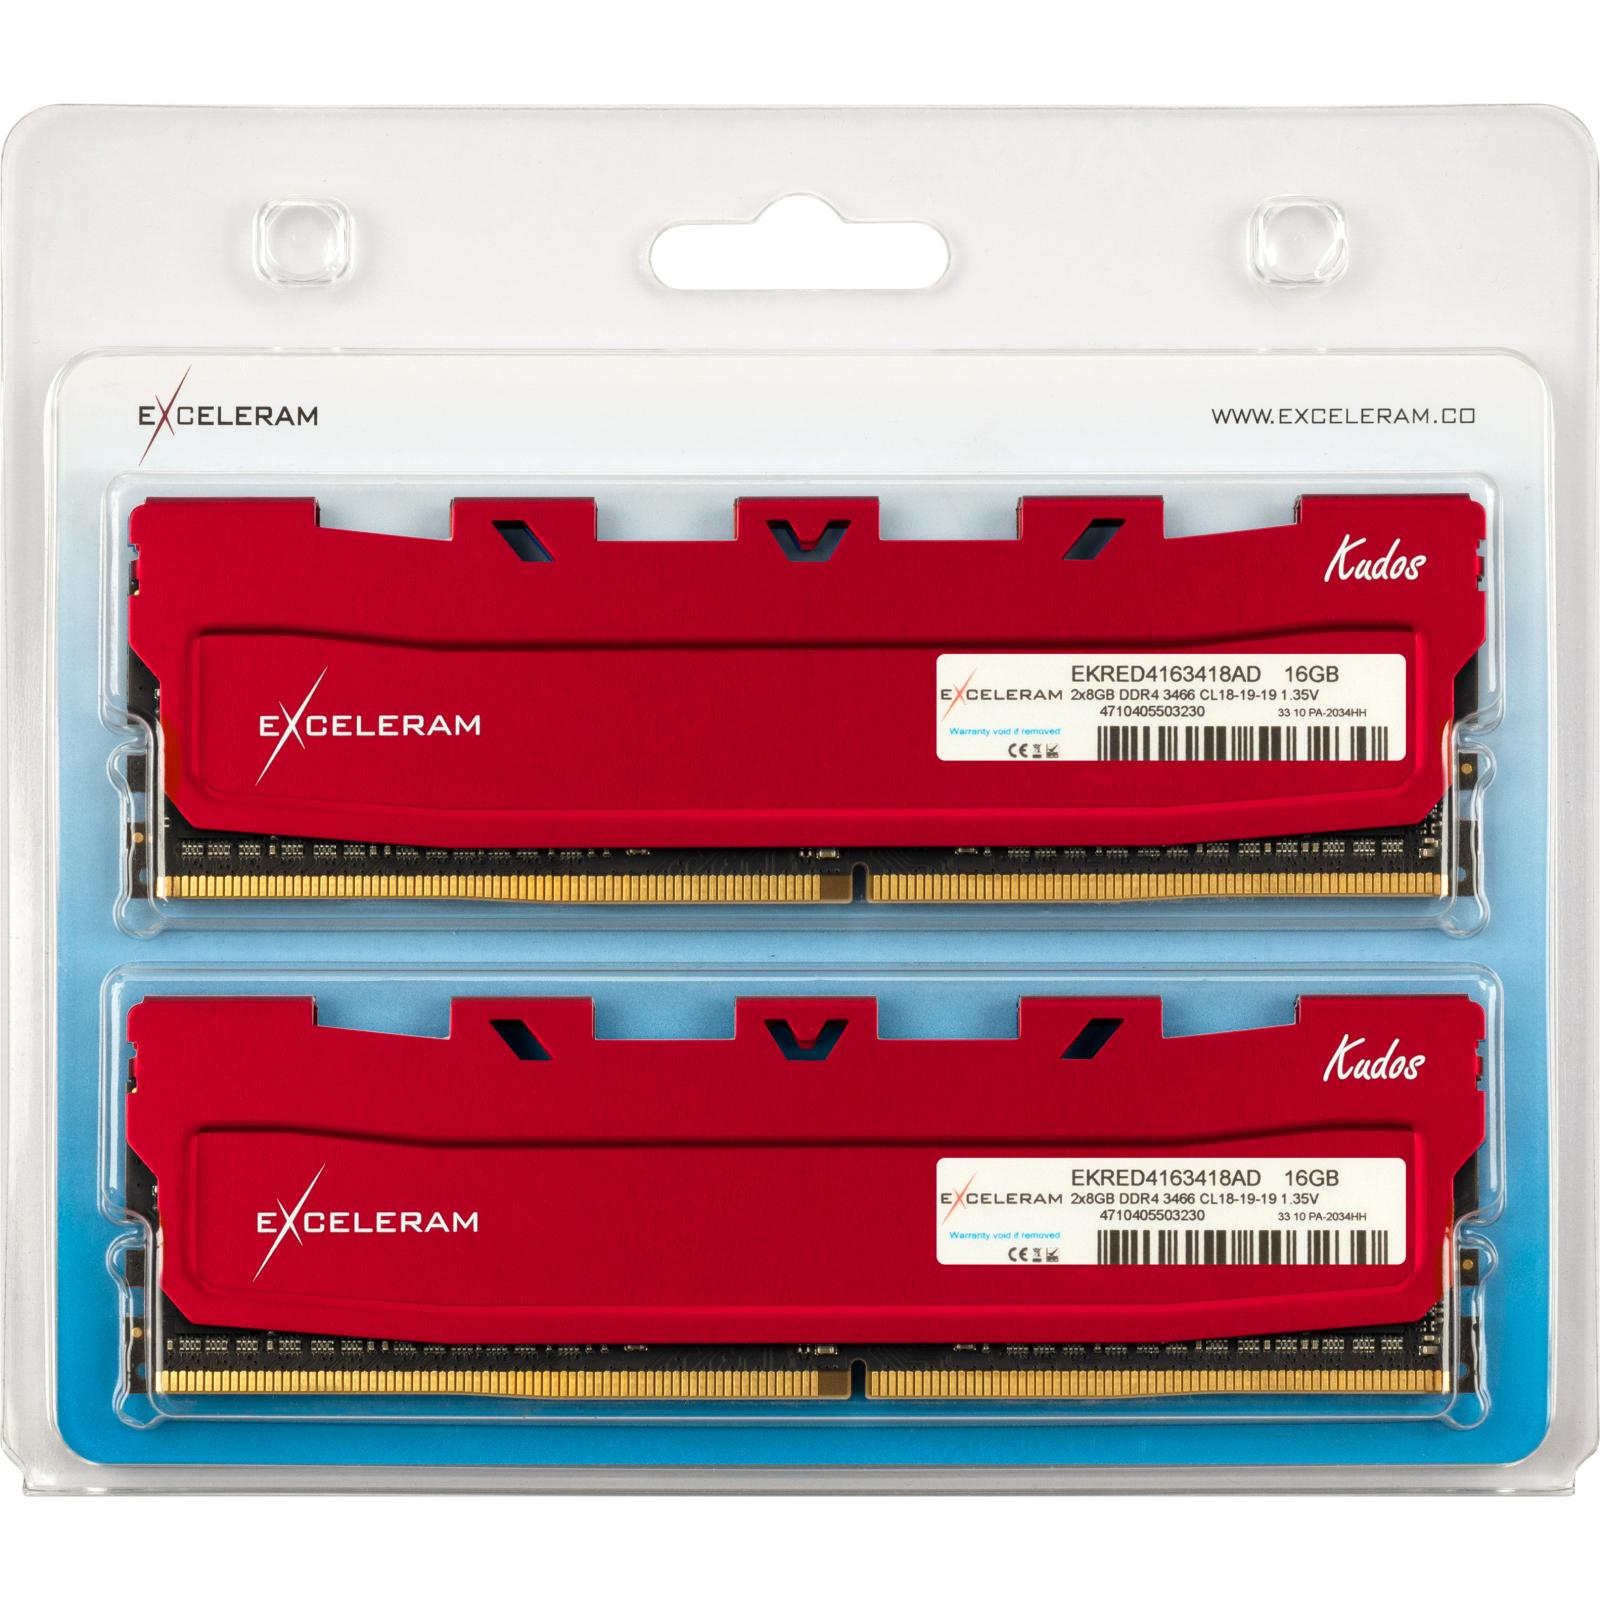 Модуль памяти для компьютера DDR4 16GB (2x8GB) 3466 MHz Kudos Red eXceleram (EKRED4163418AD) изображение 2